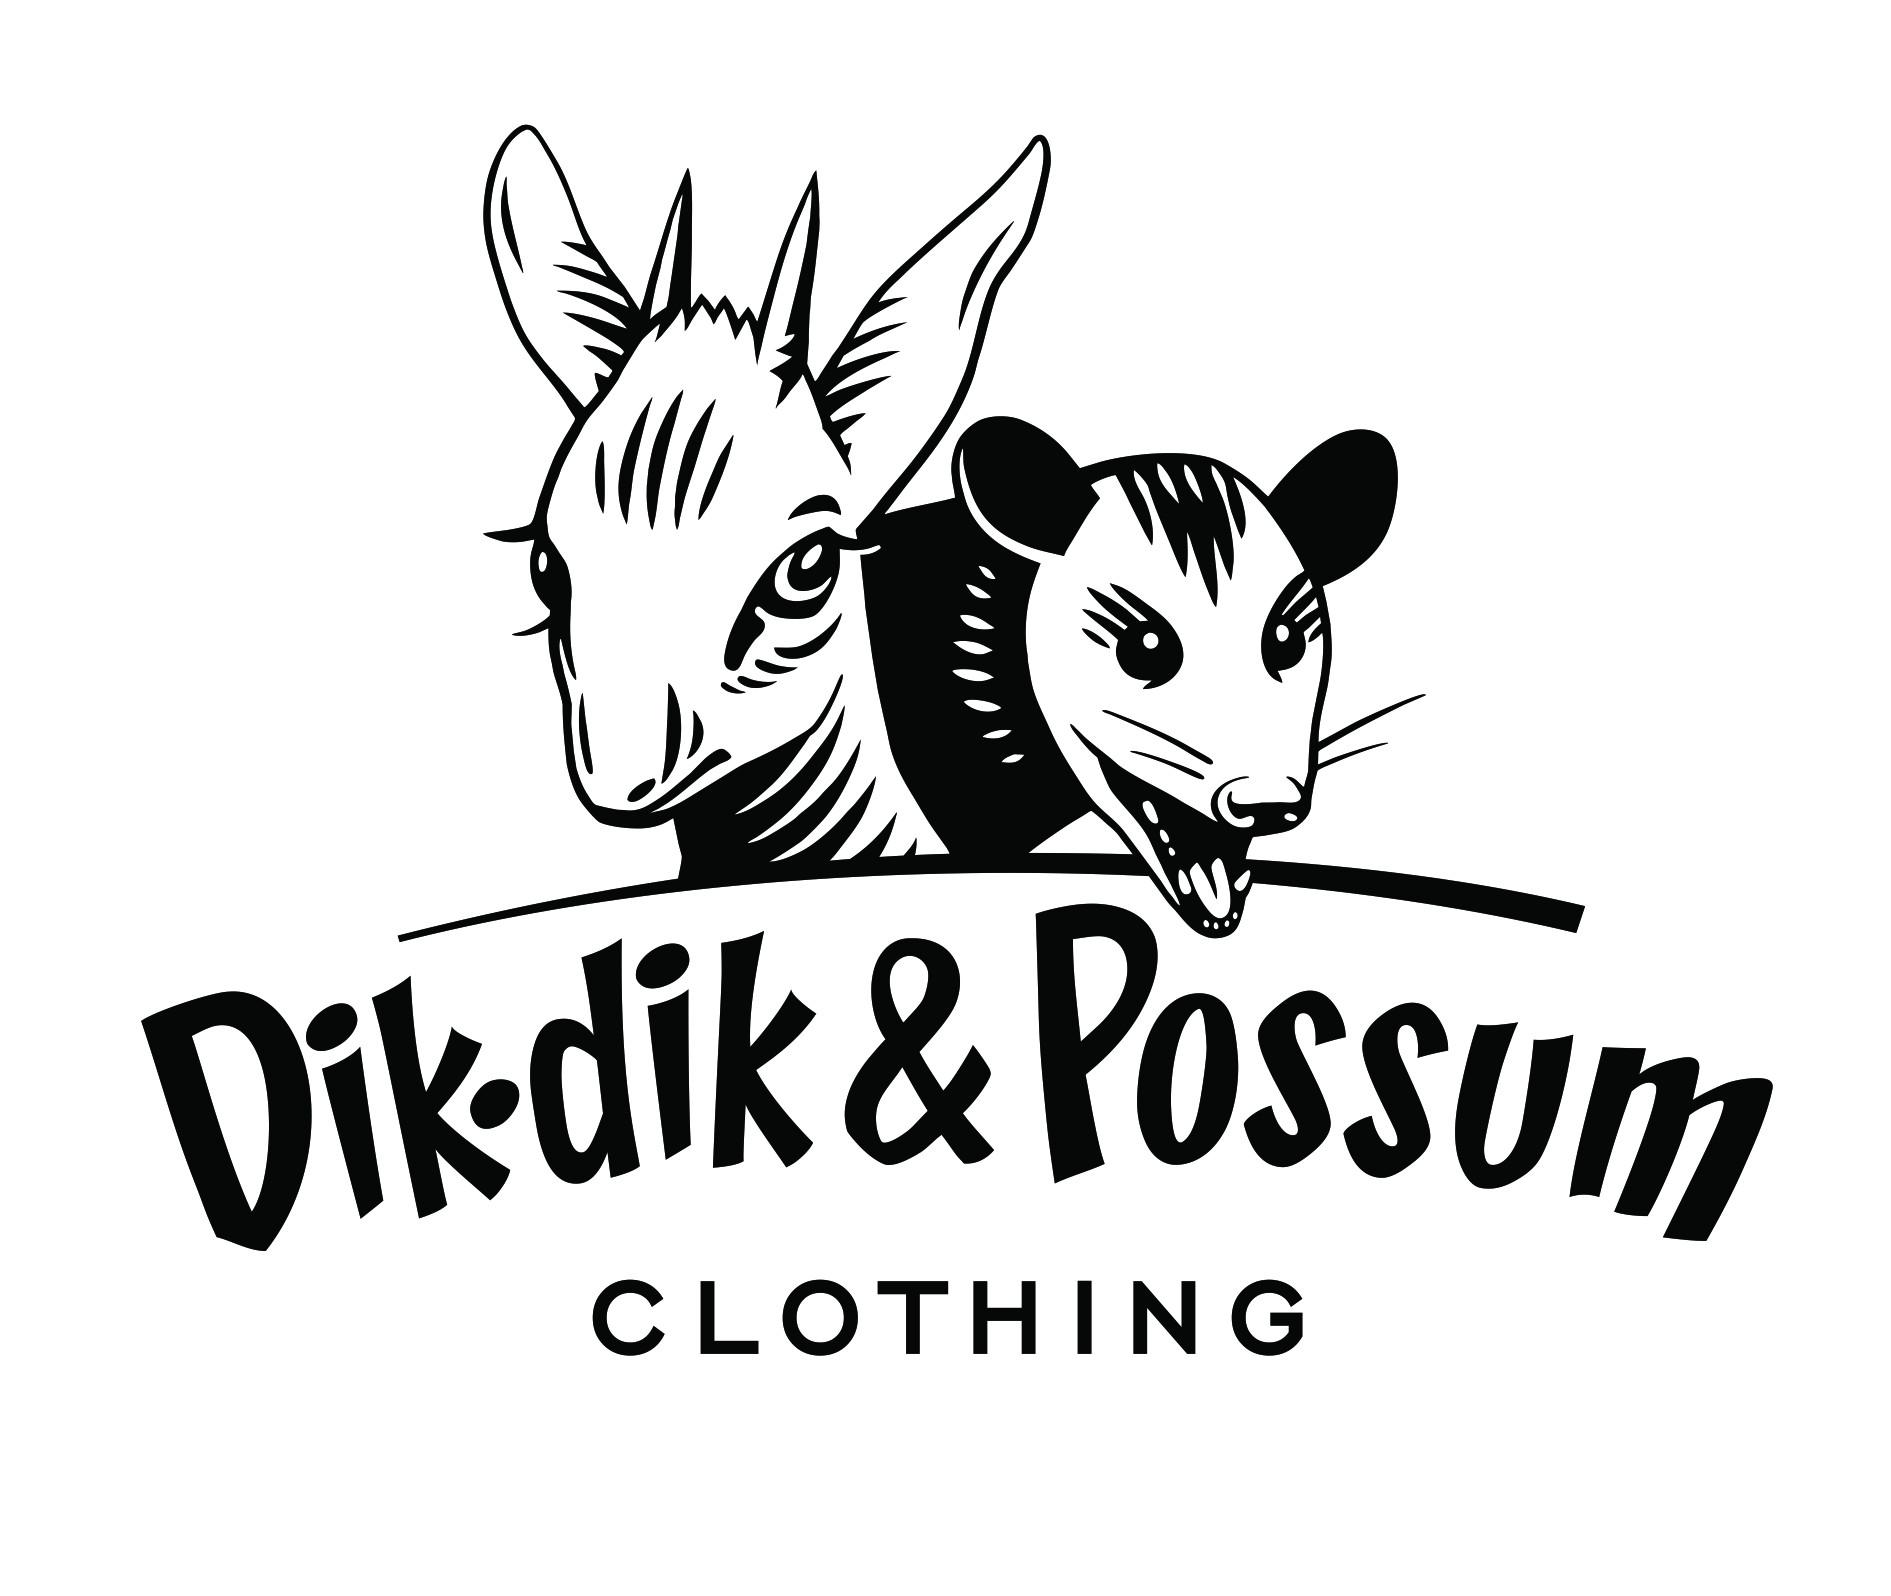 Dik-dik & Possum